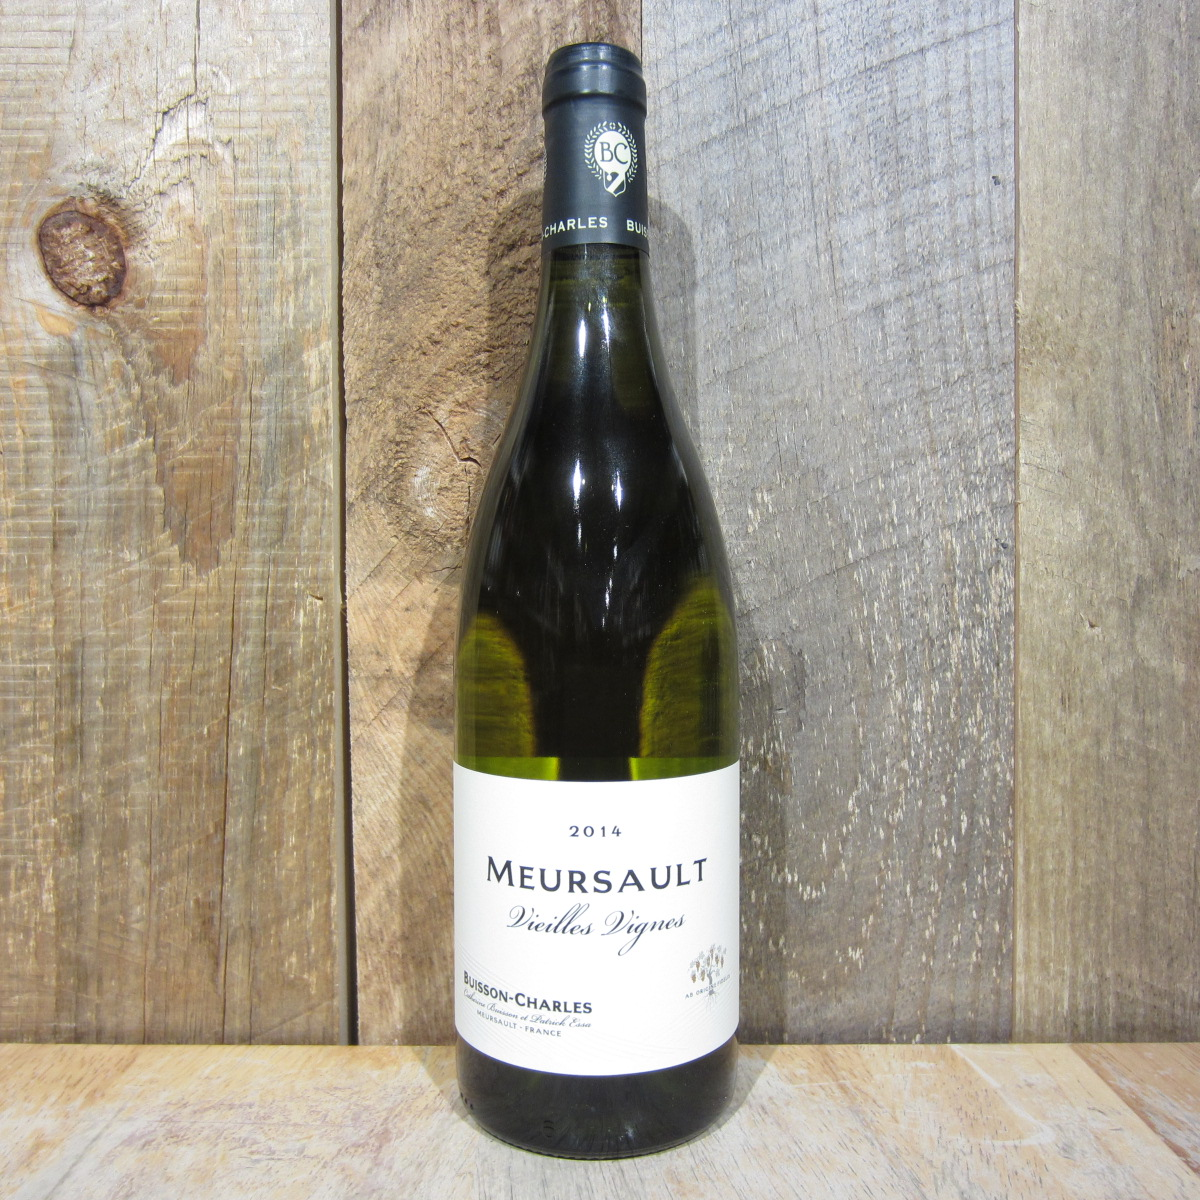 Charles Buisson Meursault Vieilles Vignes 2014 750ml